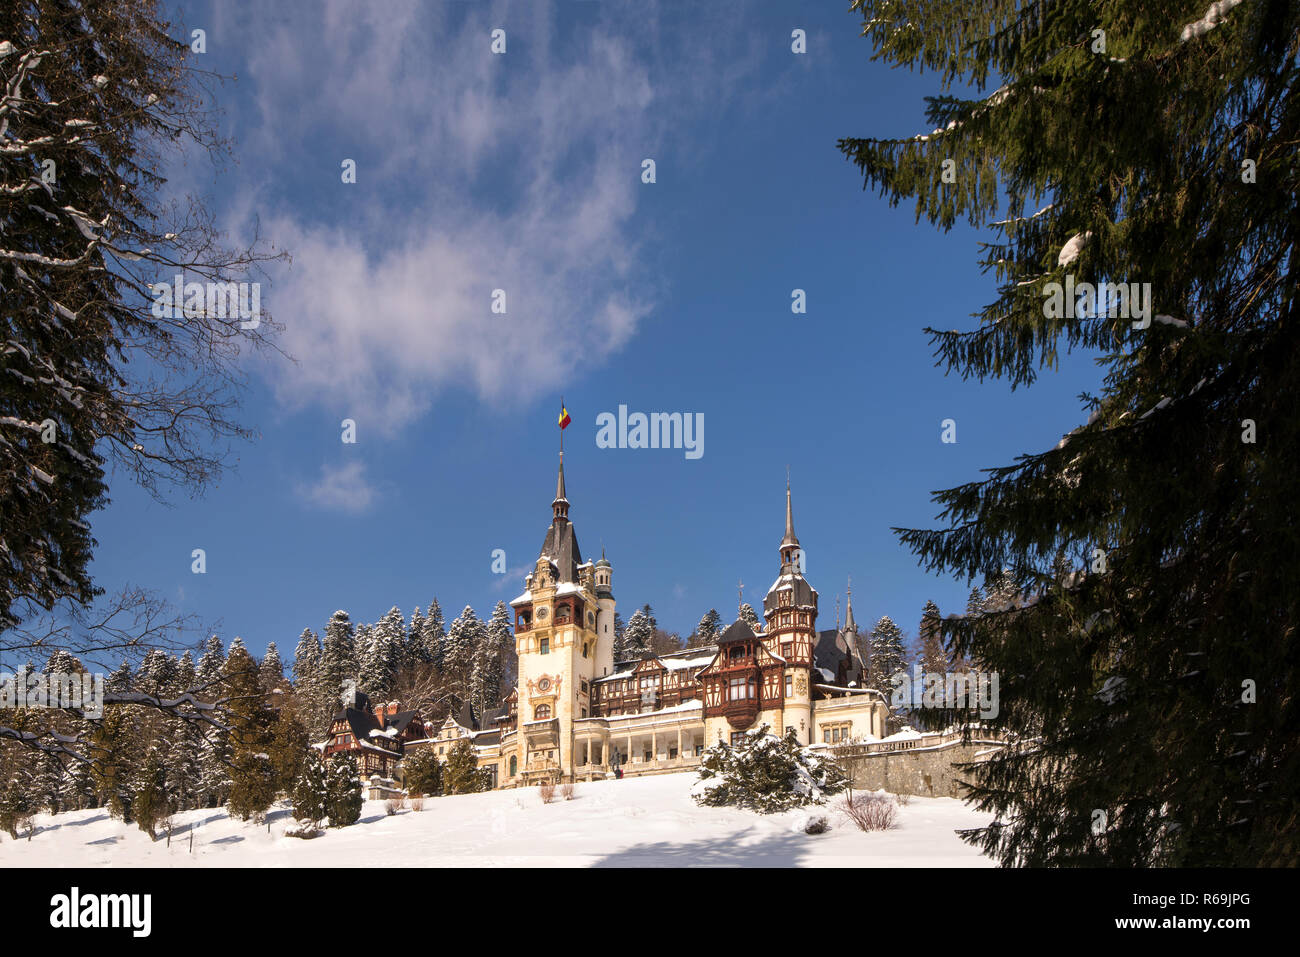 Peles castle in Romania. Beautiful, royal castle in snowy, white winter. Stock Photo